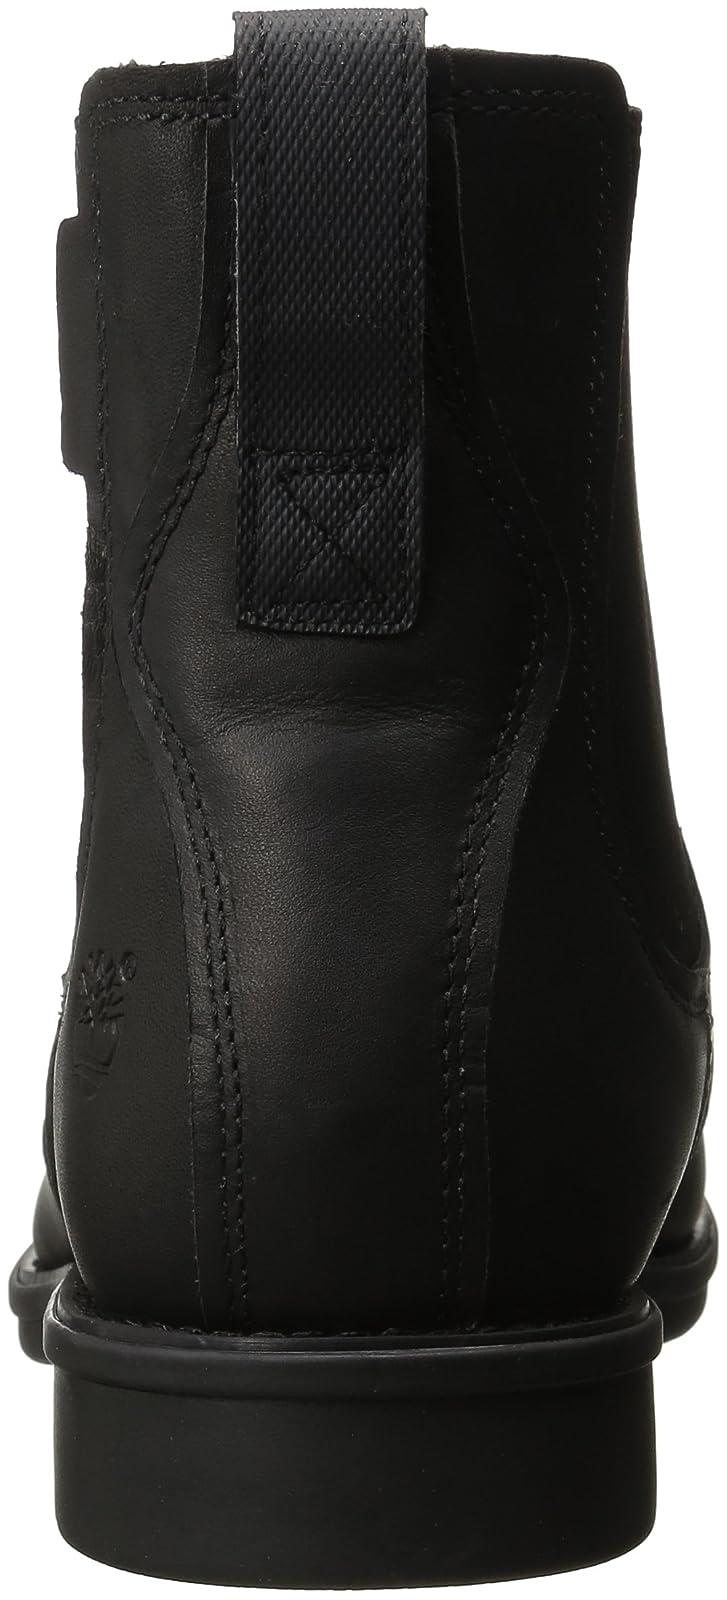 Timberland Men's Carter Notch PT Chelsea Boot 8 M US - 2